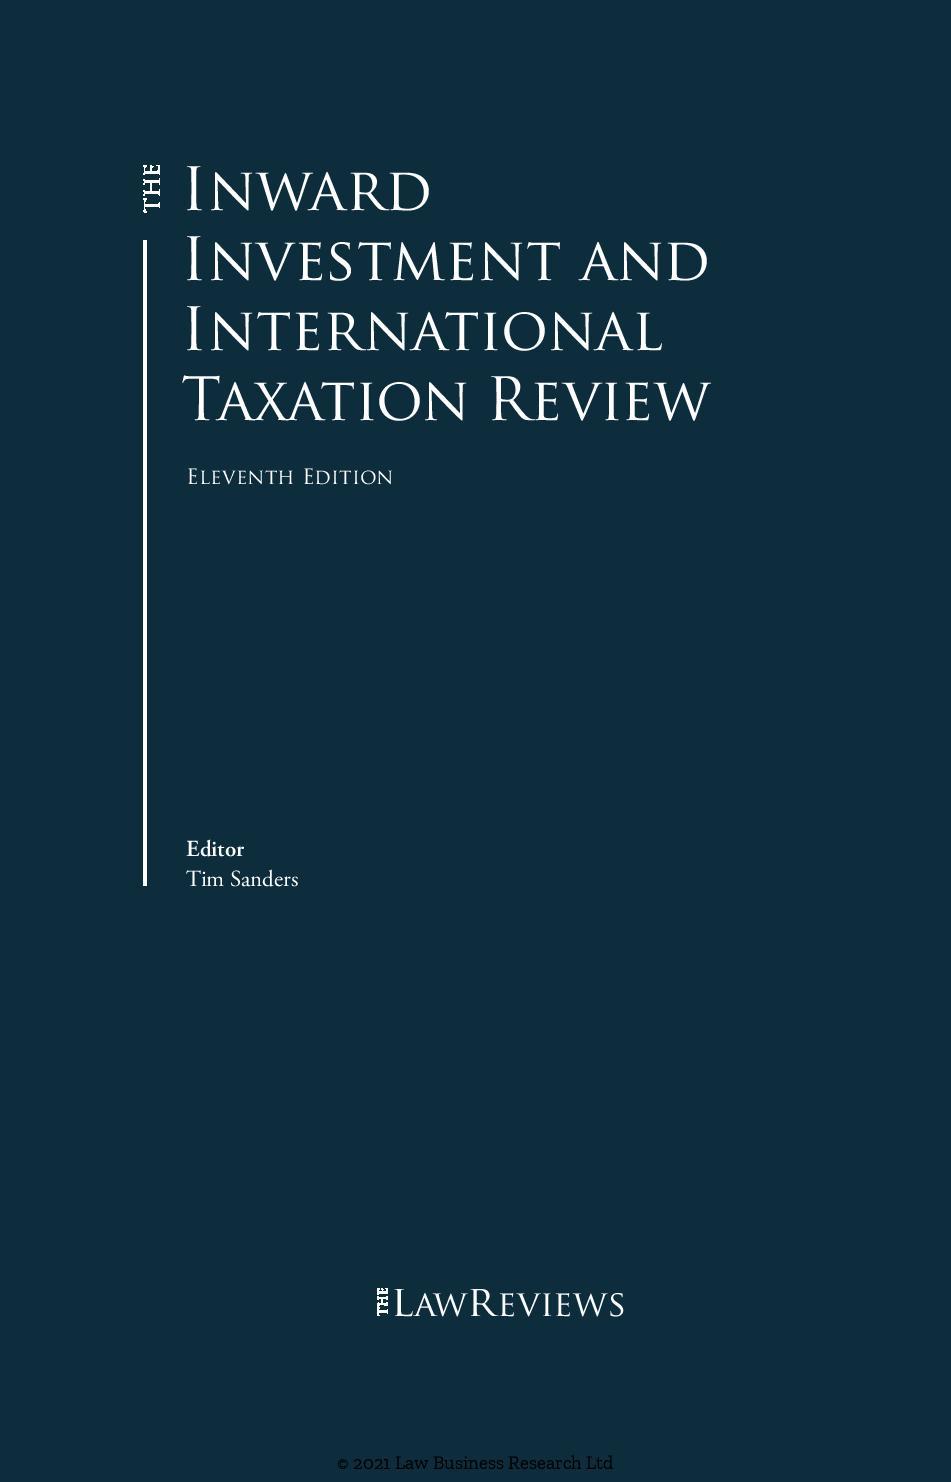 Patrikios Pavlou & Associates LLC: The Inward Investment and International Taxation Review